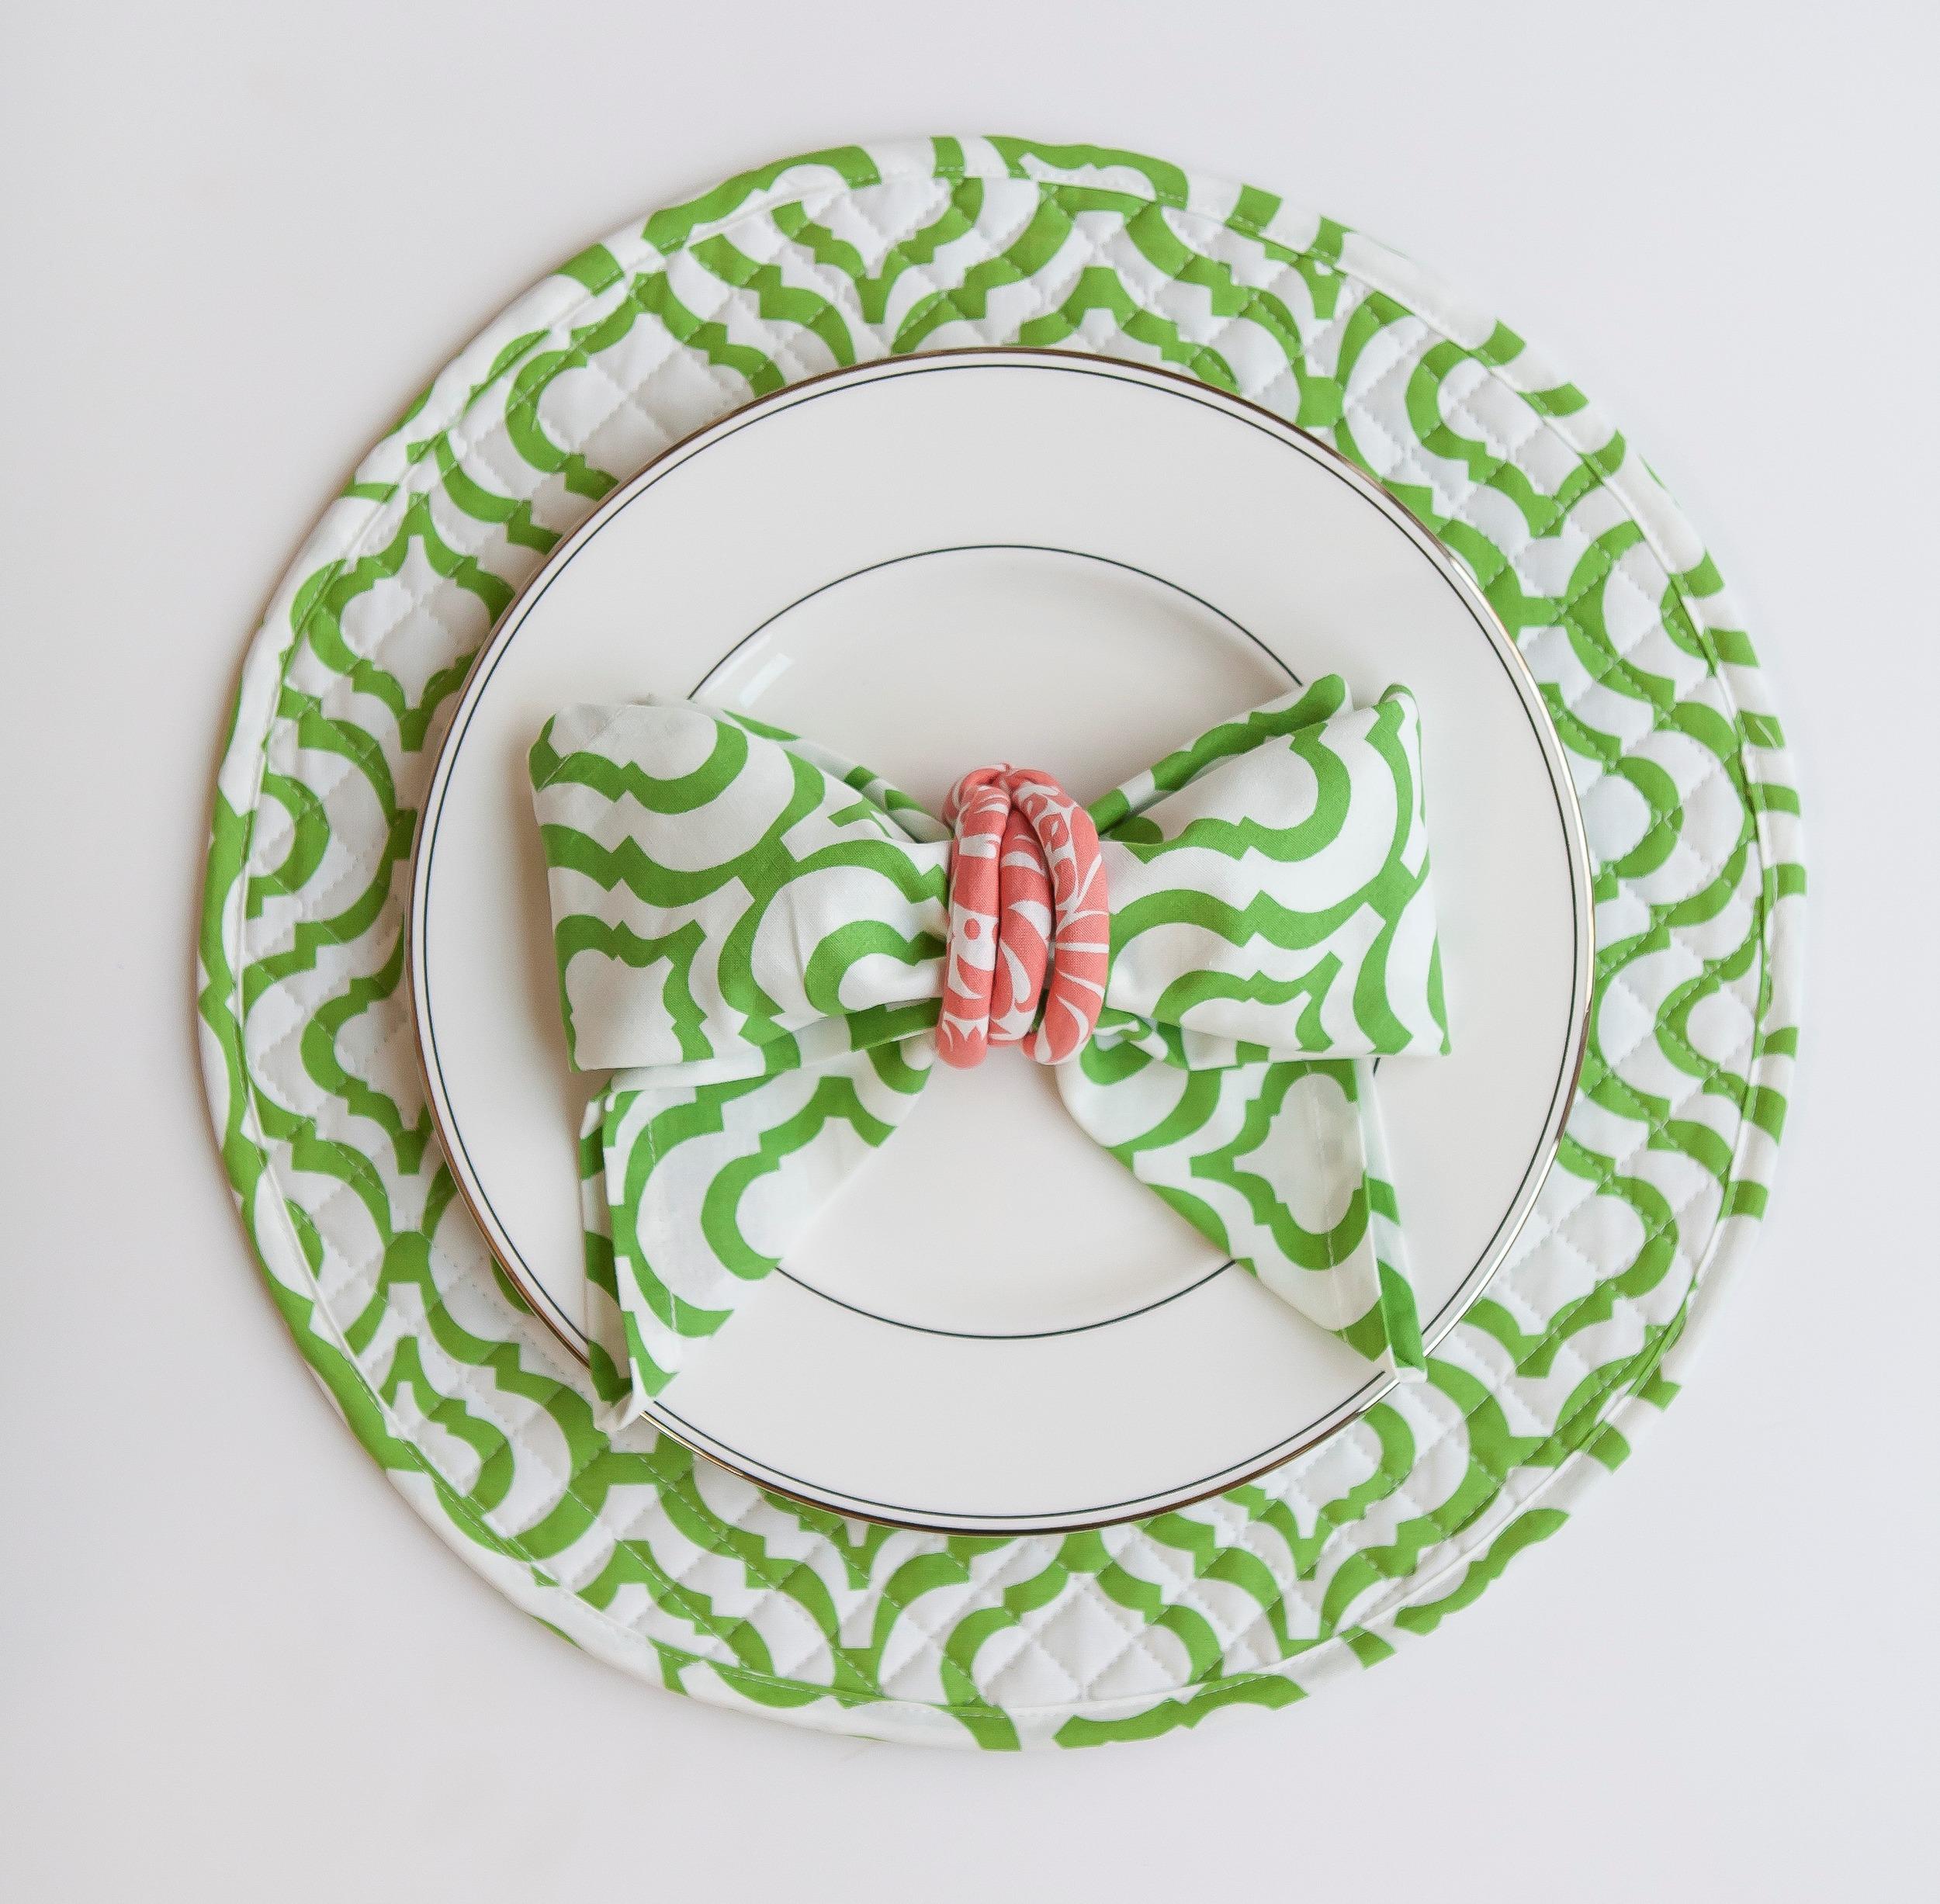 green and white bow cloth napkin fold